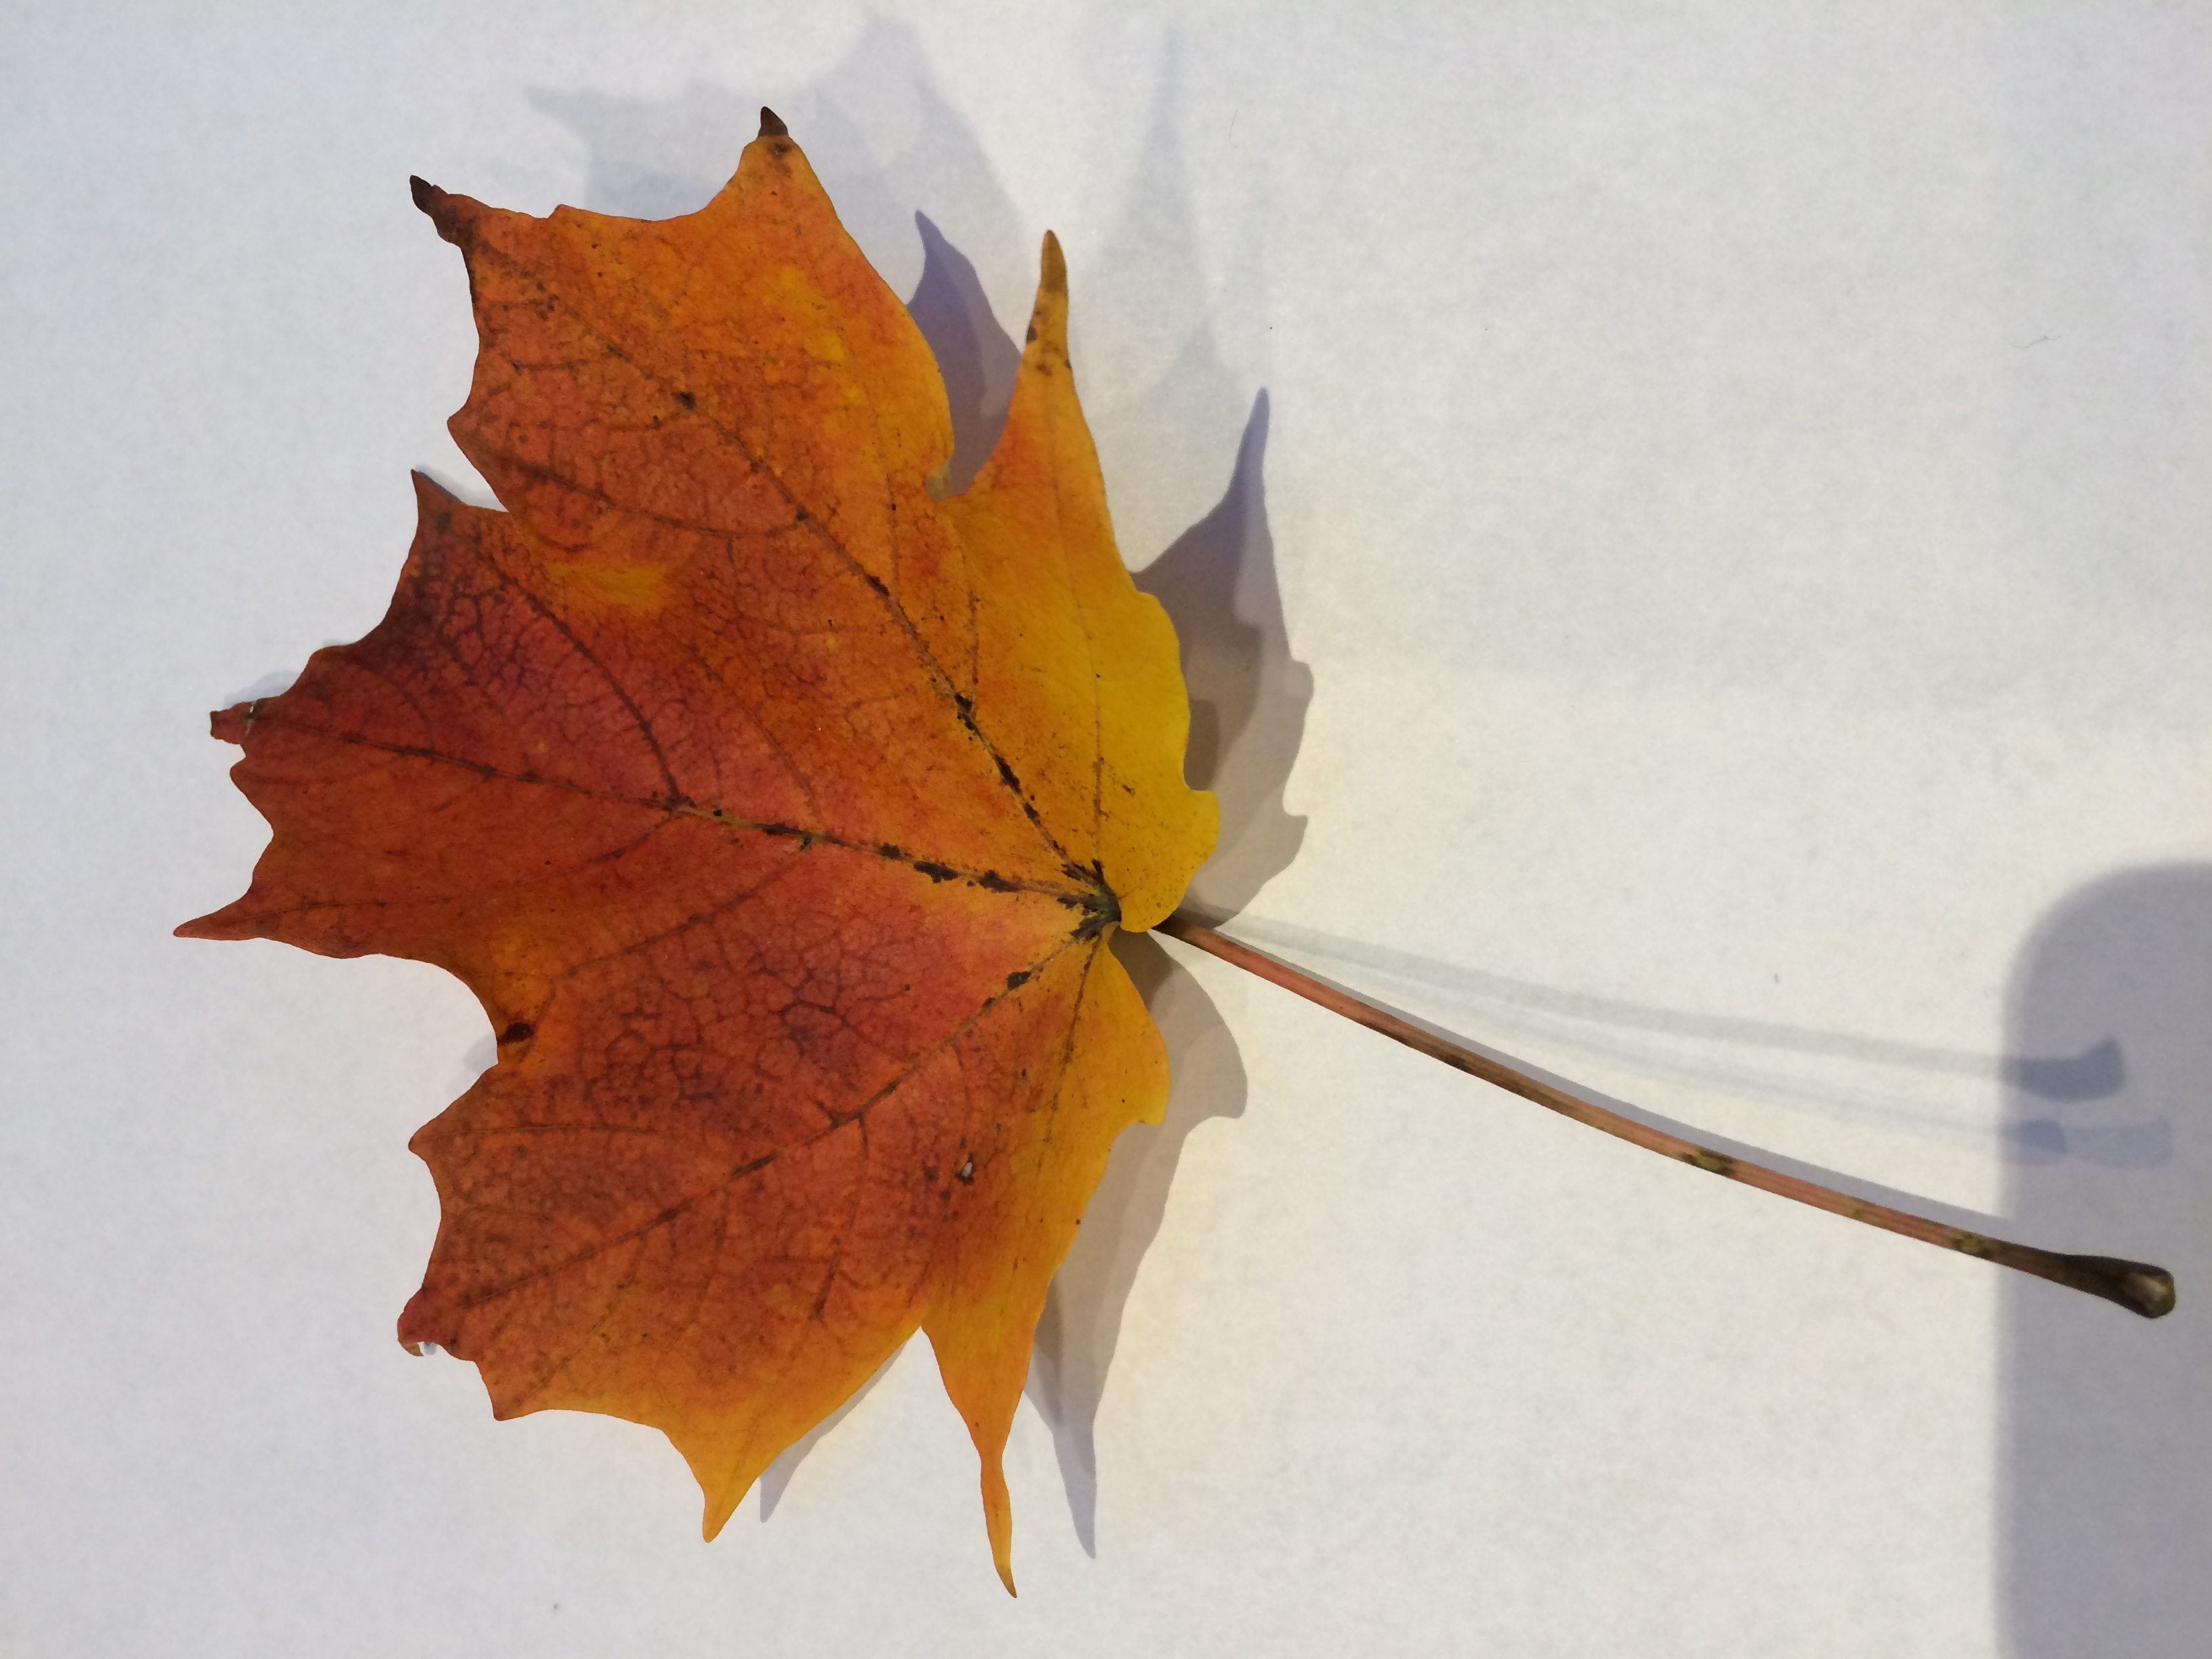 gwl/static/gwl/images/new-leaves/red-2.jpg